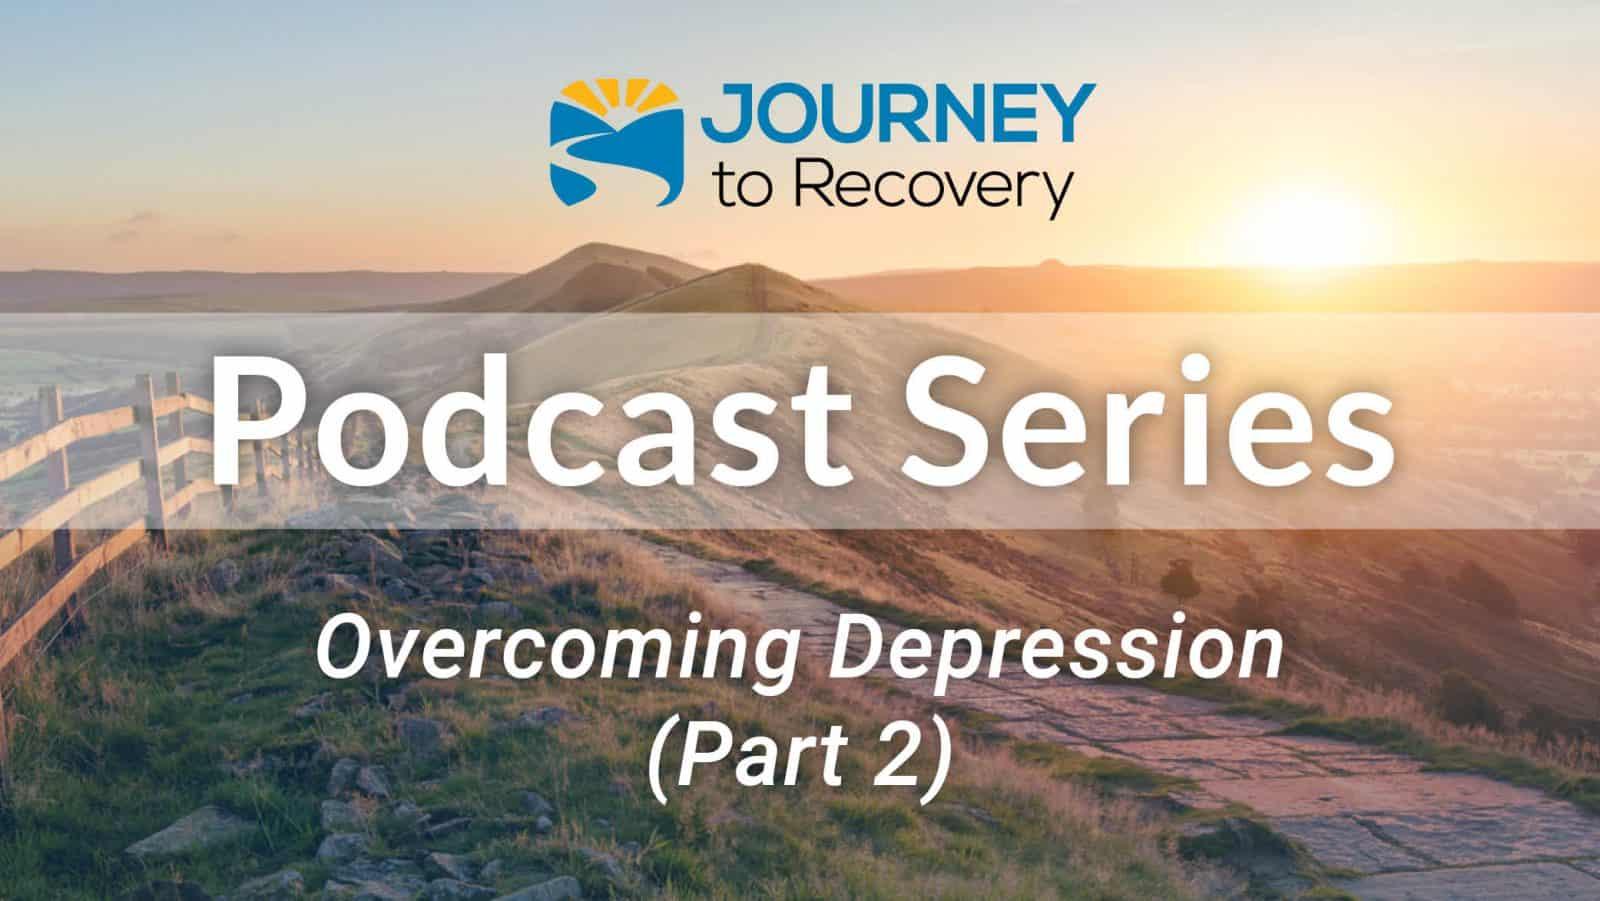 Overcoming Depression Part 2